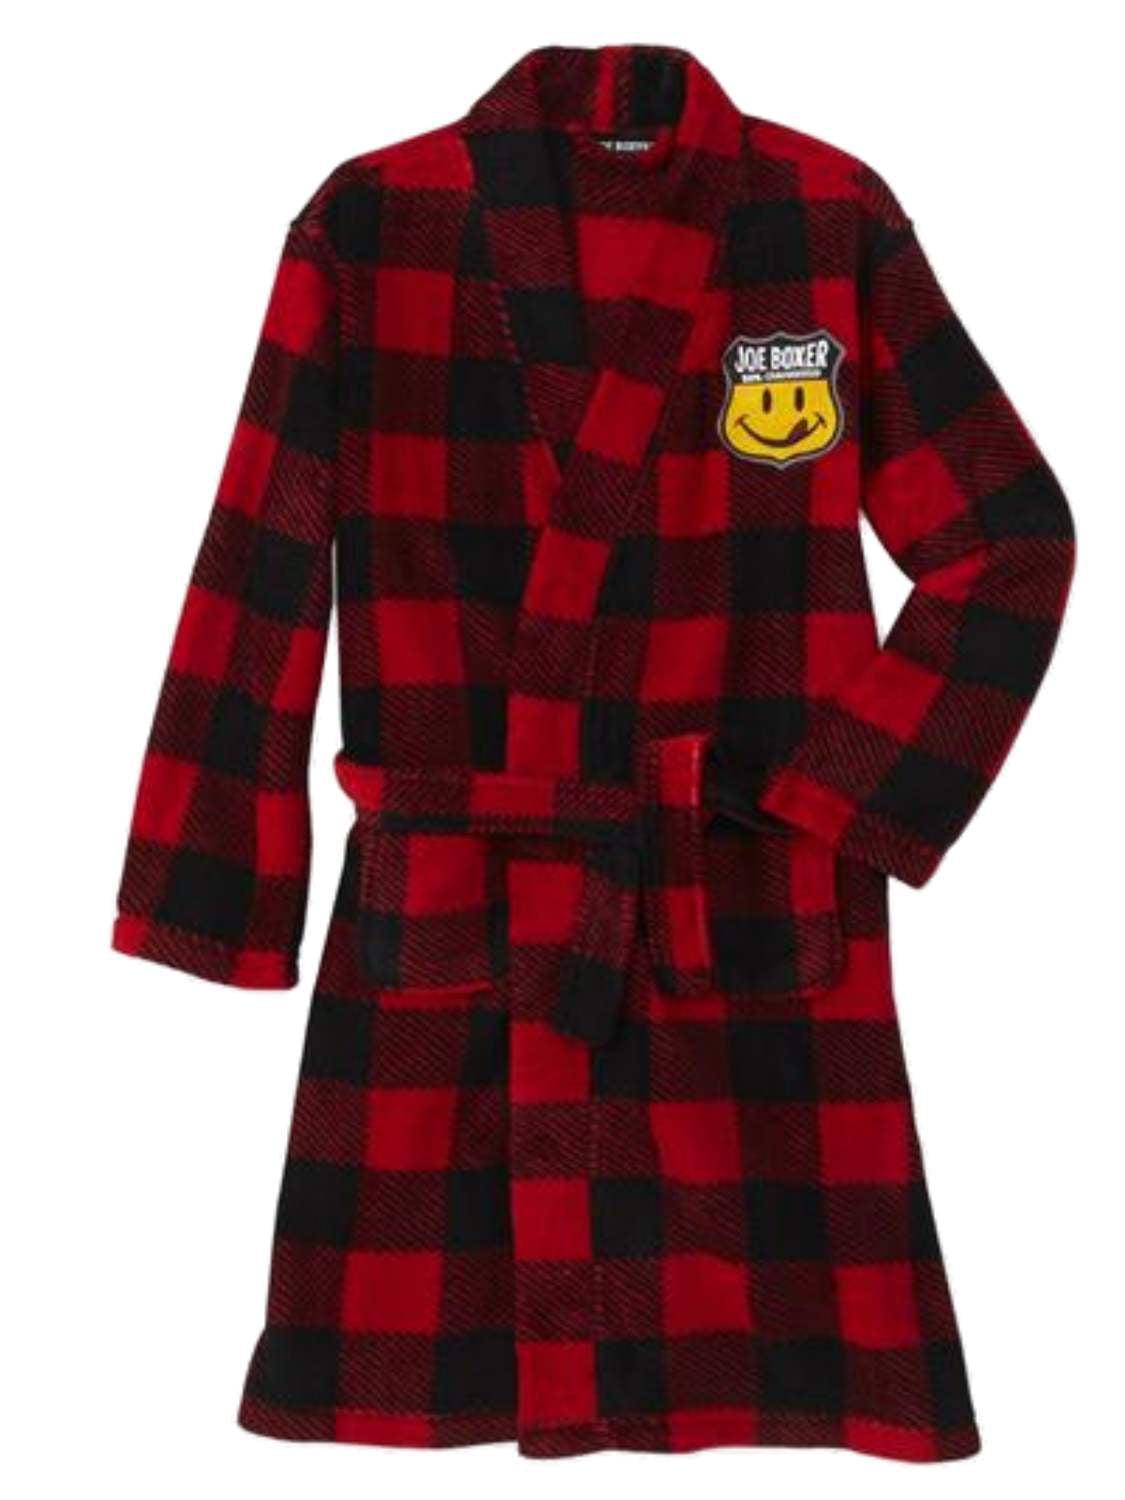 Joe Boxer Boys Red Plaid Plush Bath Robe Fleece House Coat